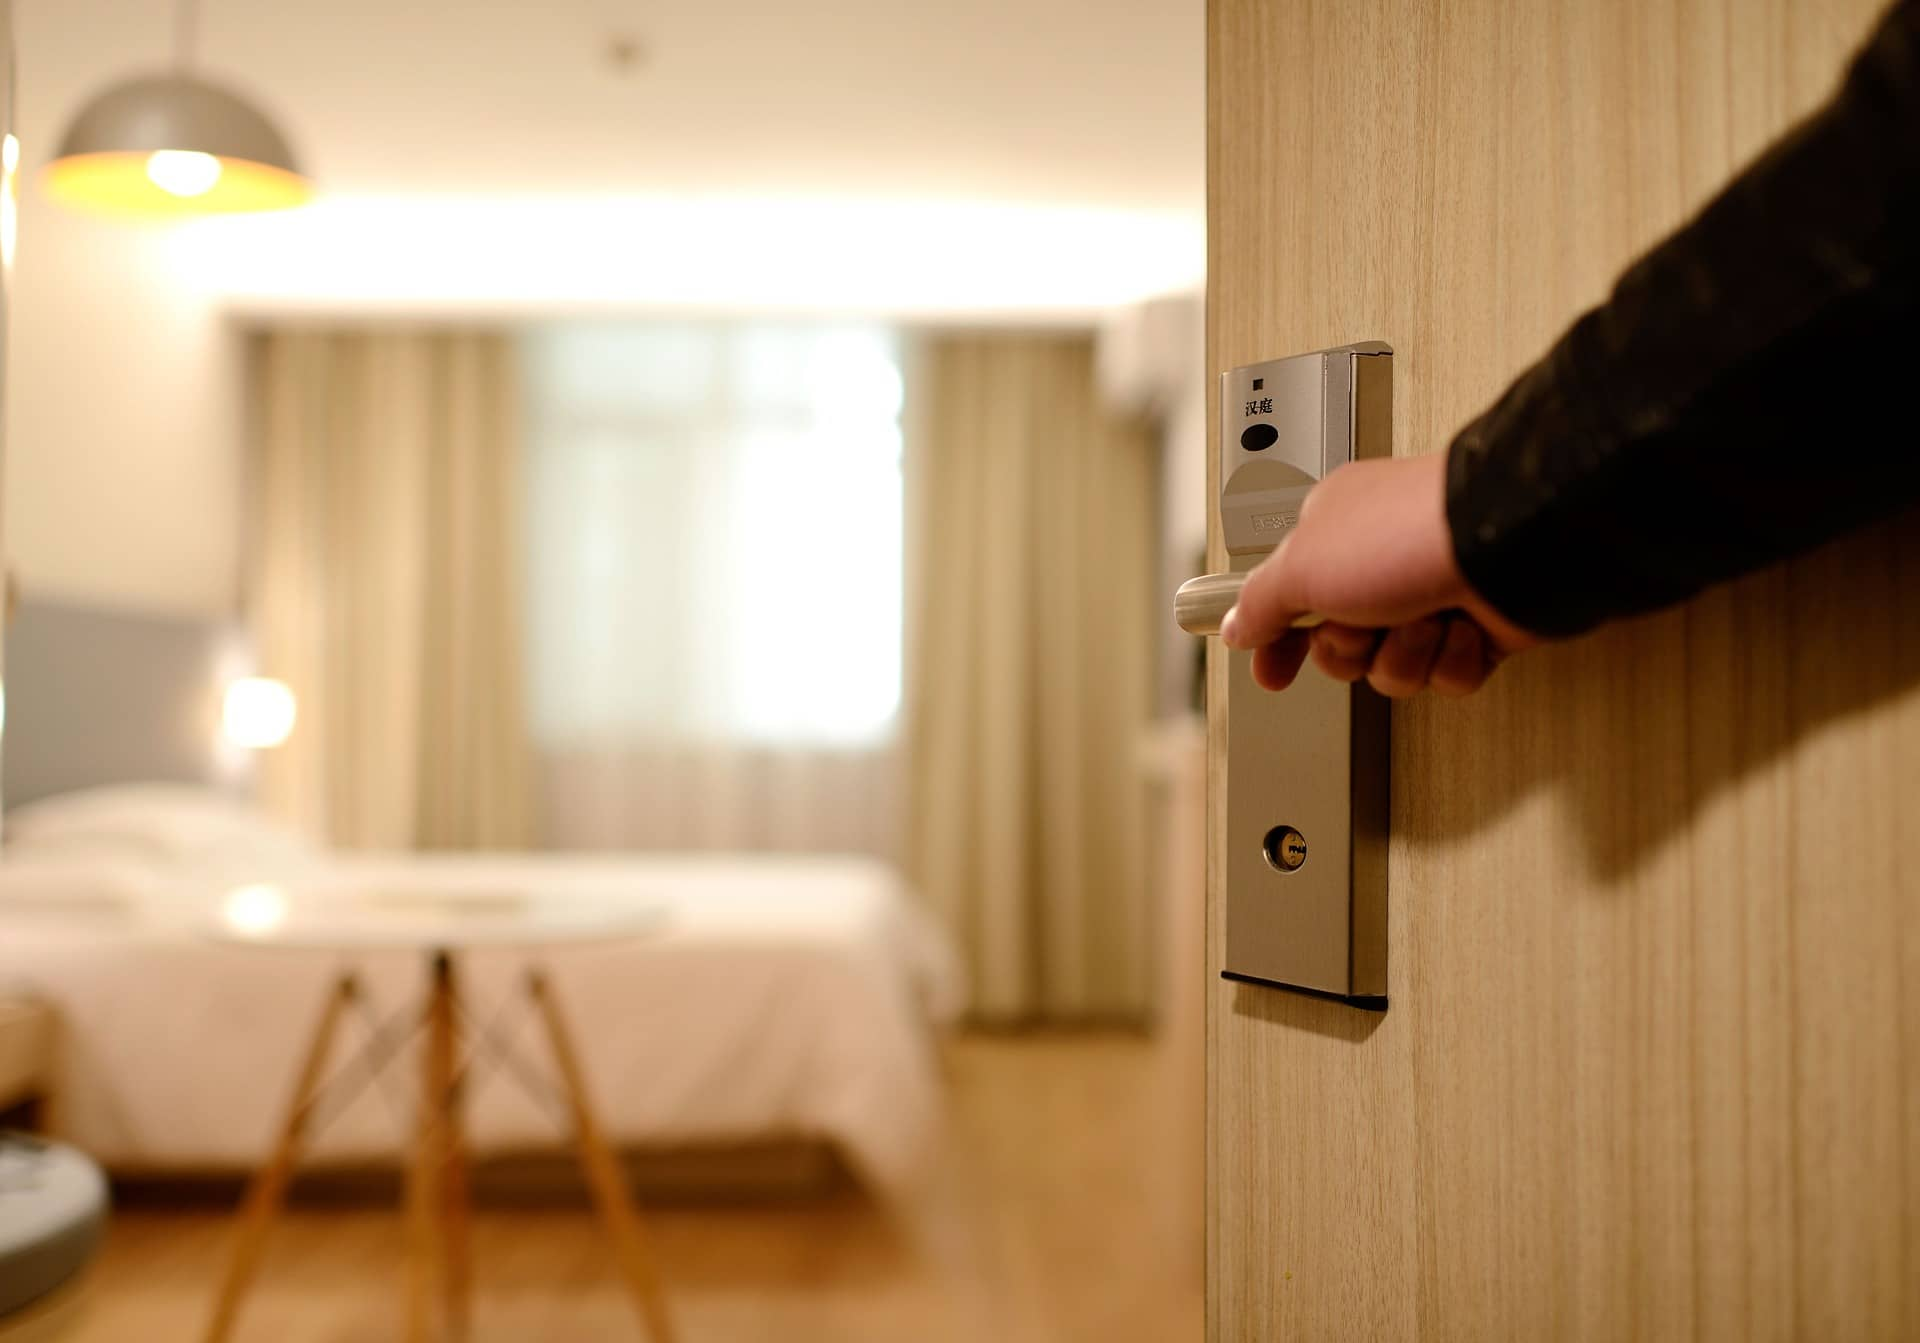 Soviel kostet die Hotel-Übernachtung im Kölner Karneval copyright: pixabay.com